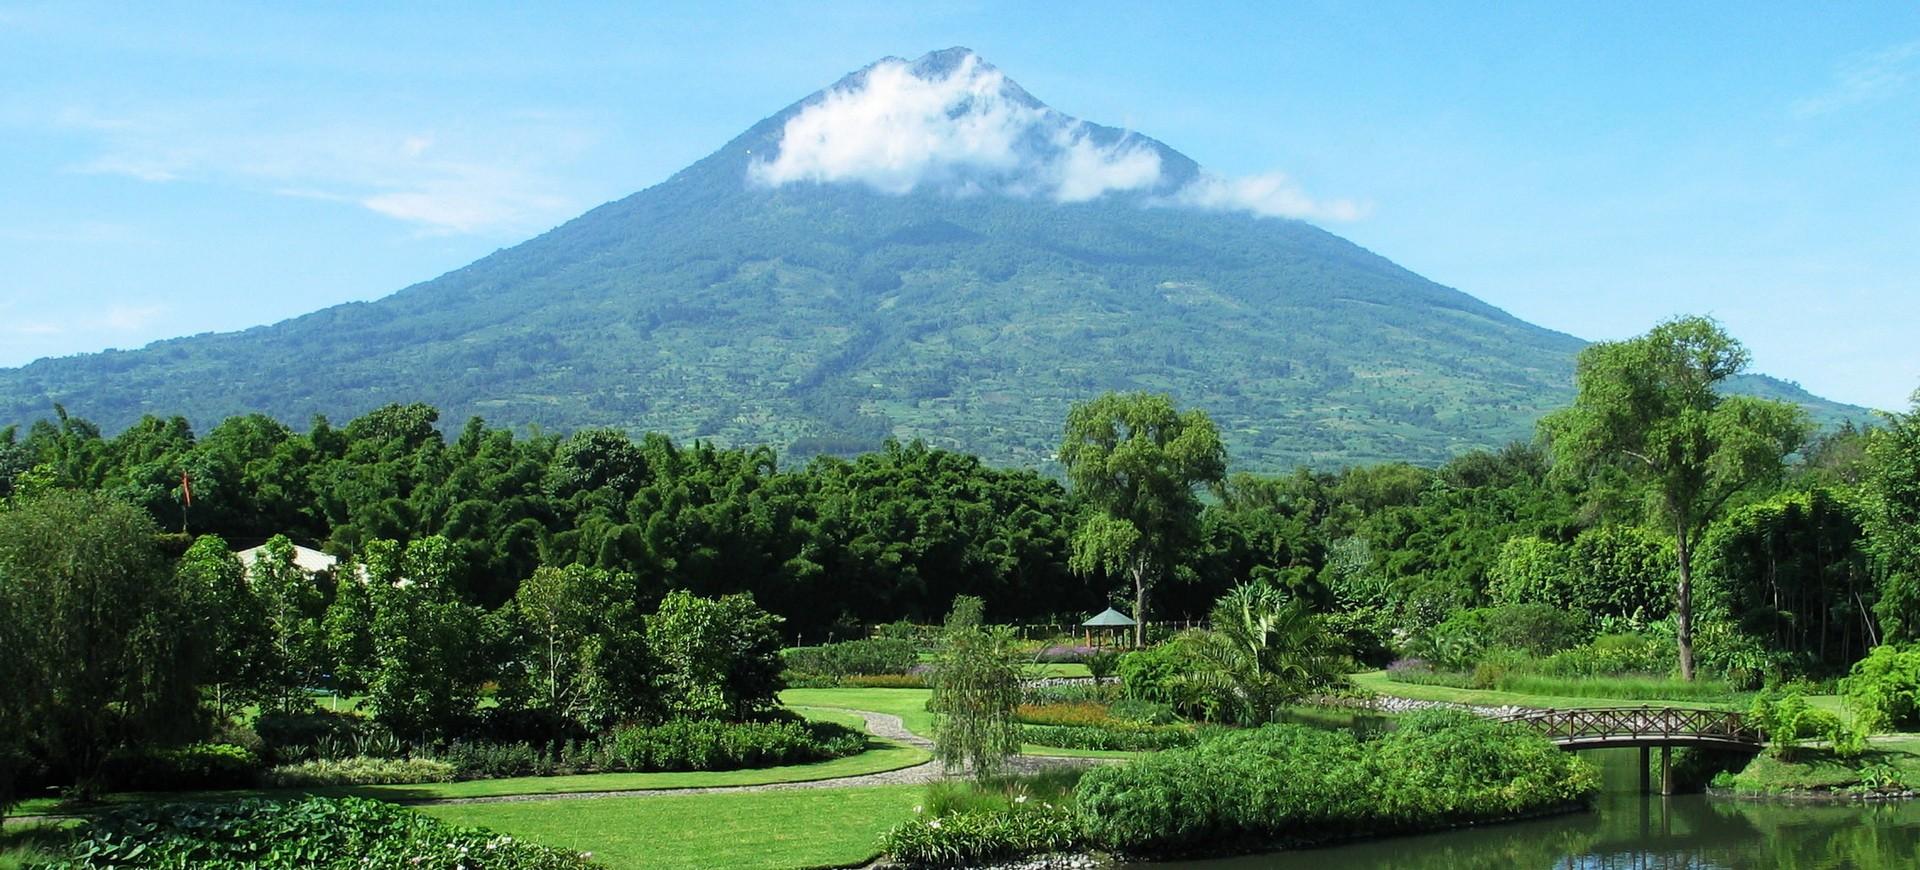 Volcan au Guatemala